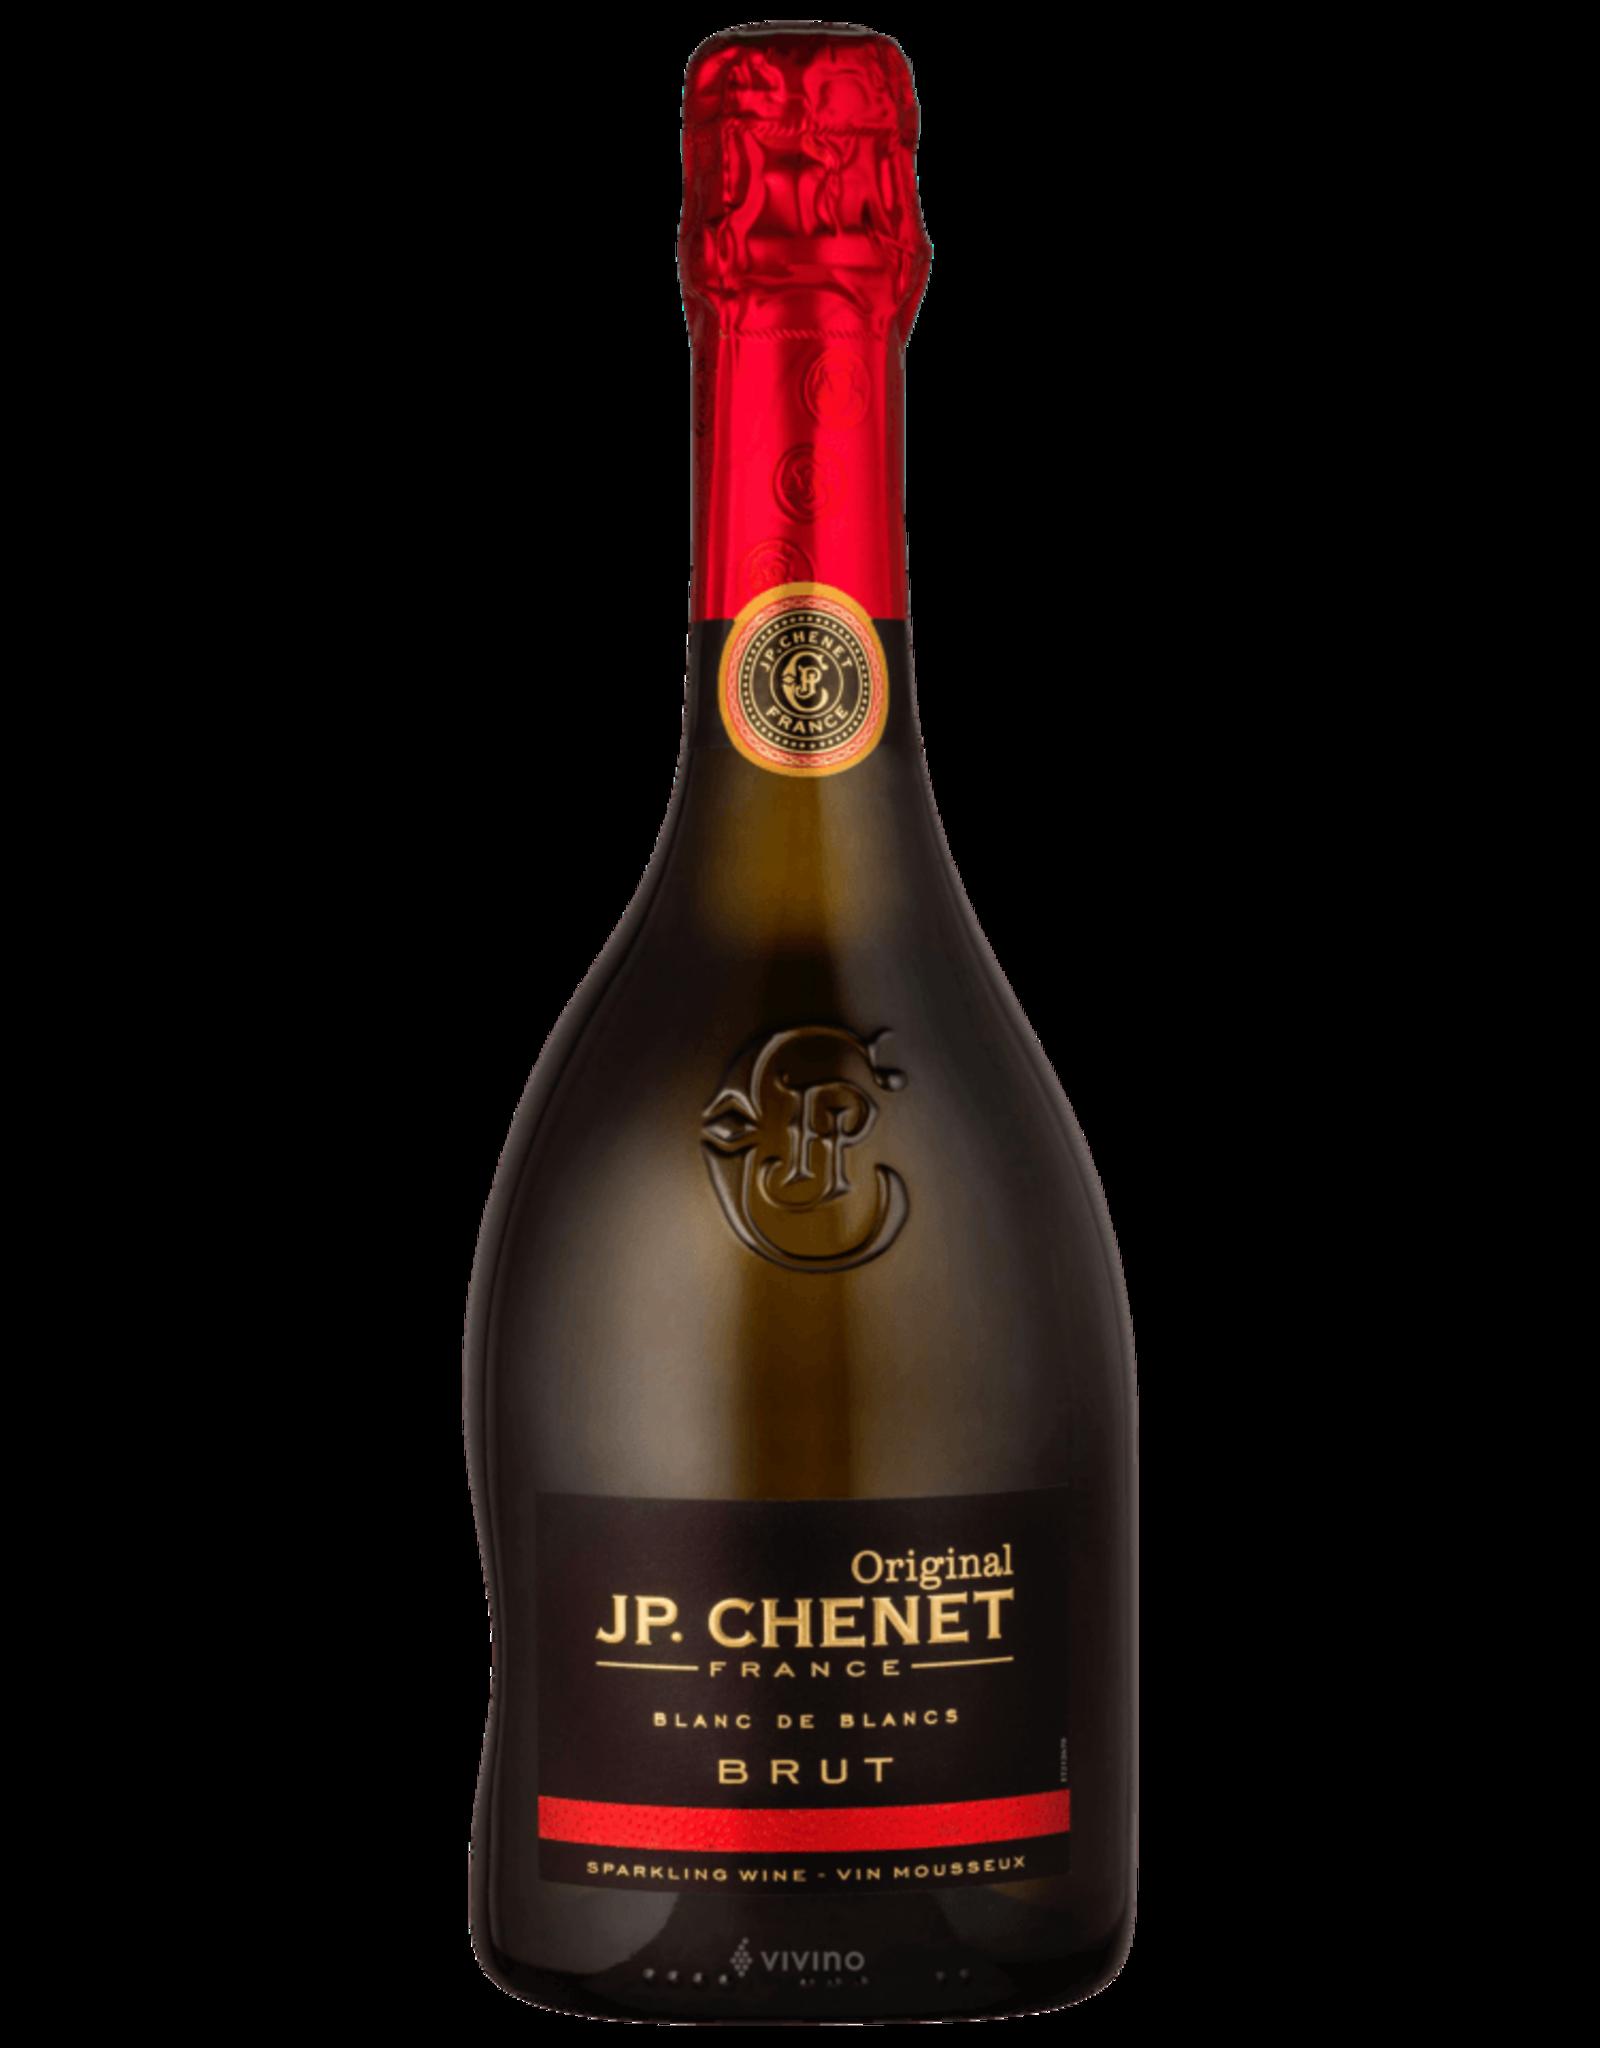 JP CHENET BRUT 750ML